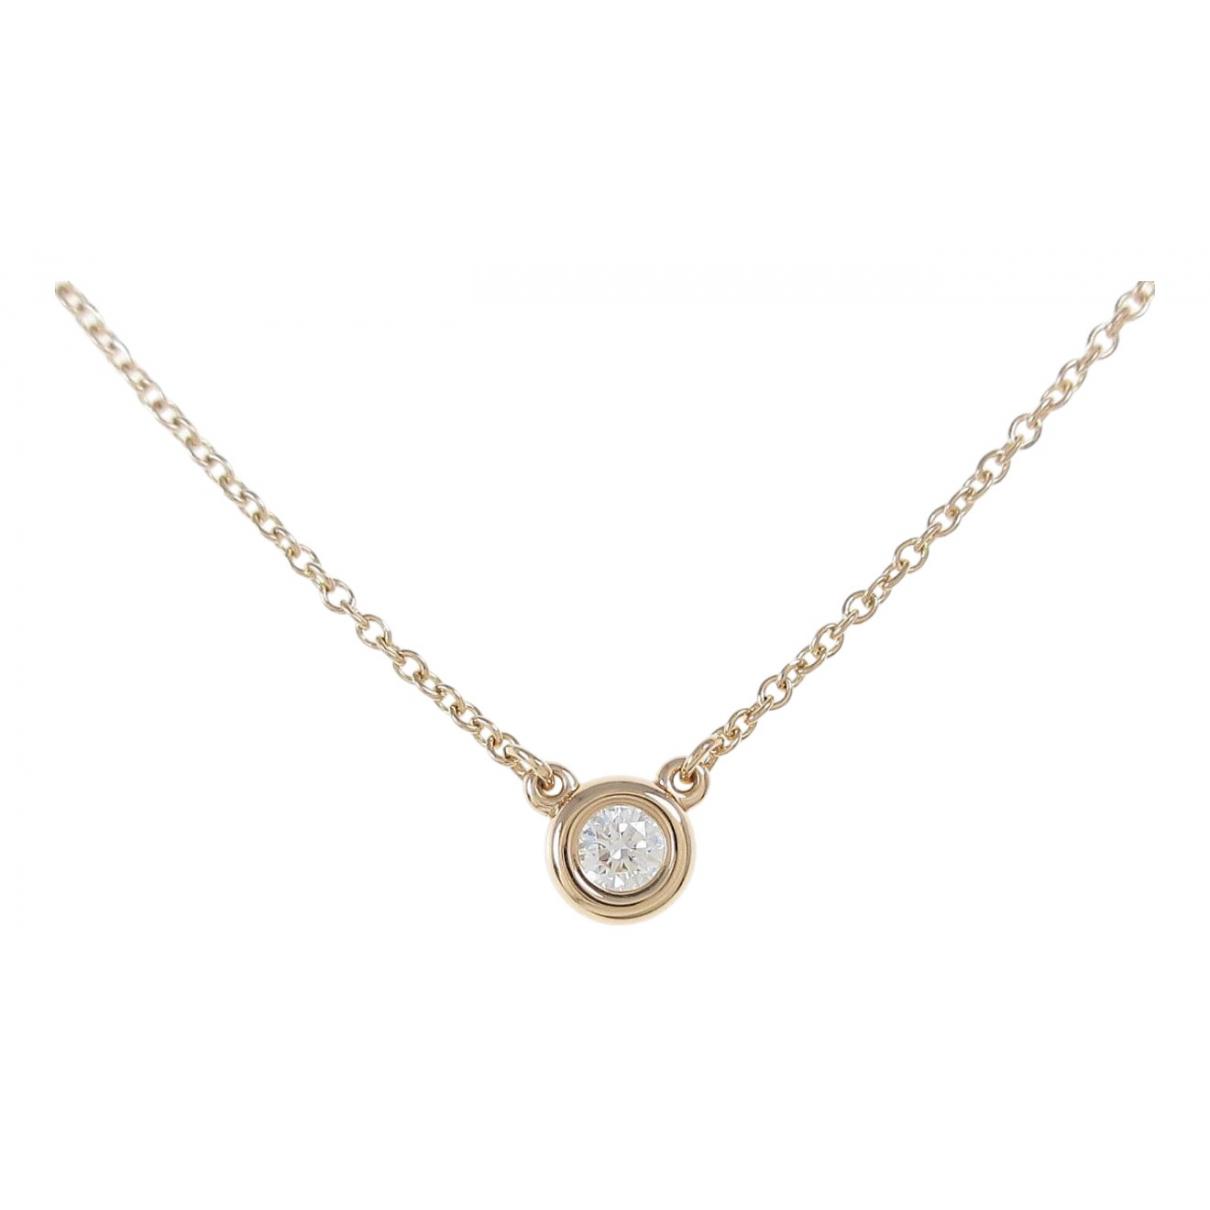 Tiffany & Co Elsa Peretti  Kette in  Gold Rosegold